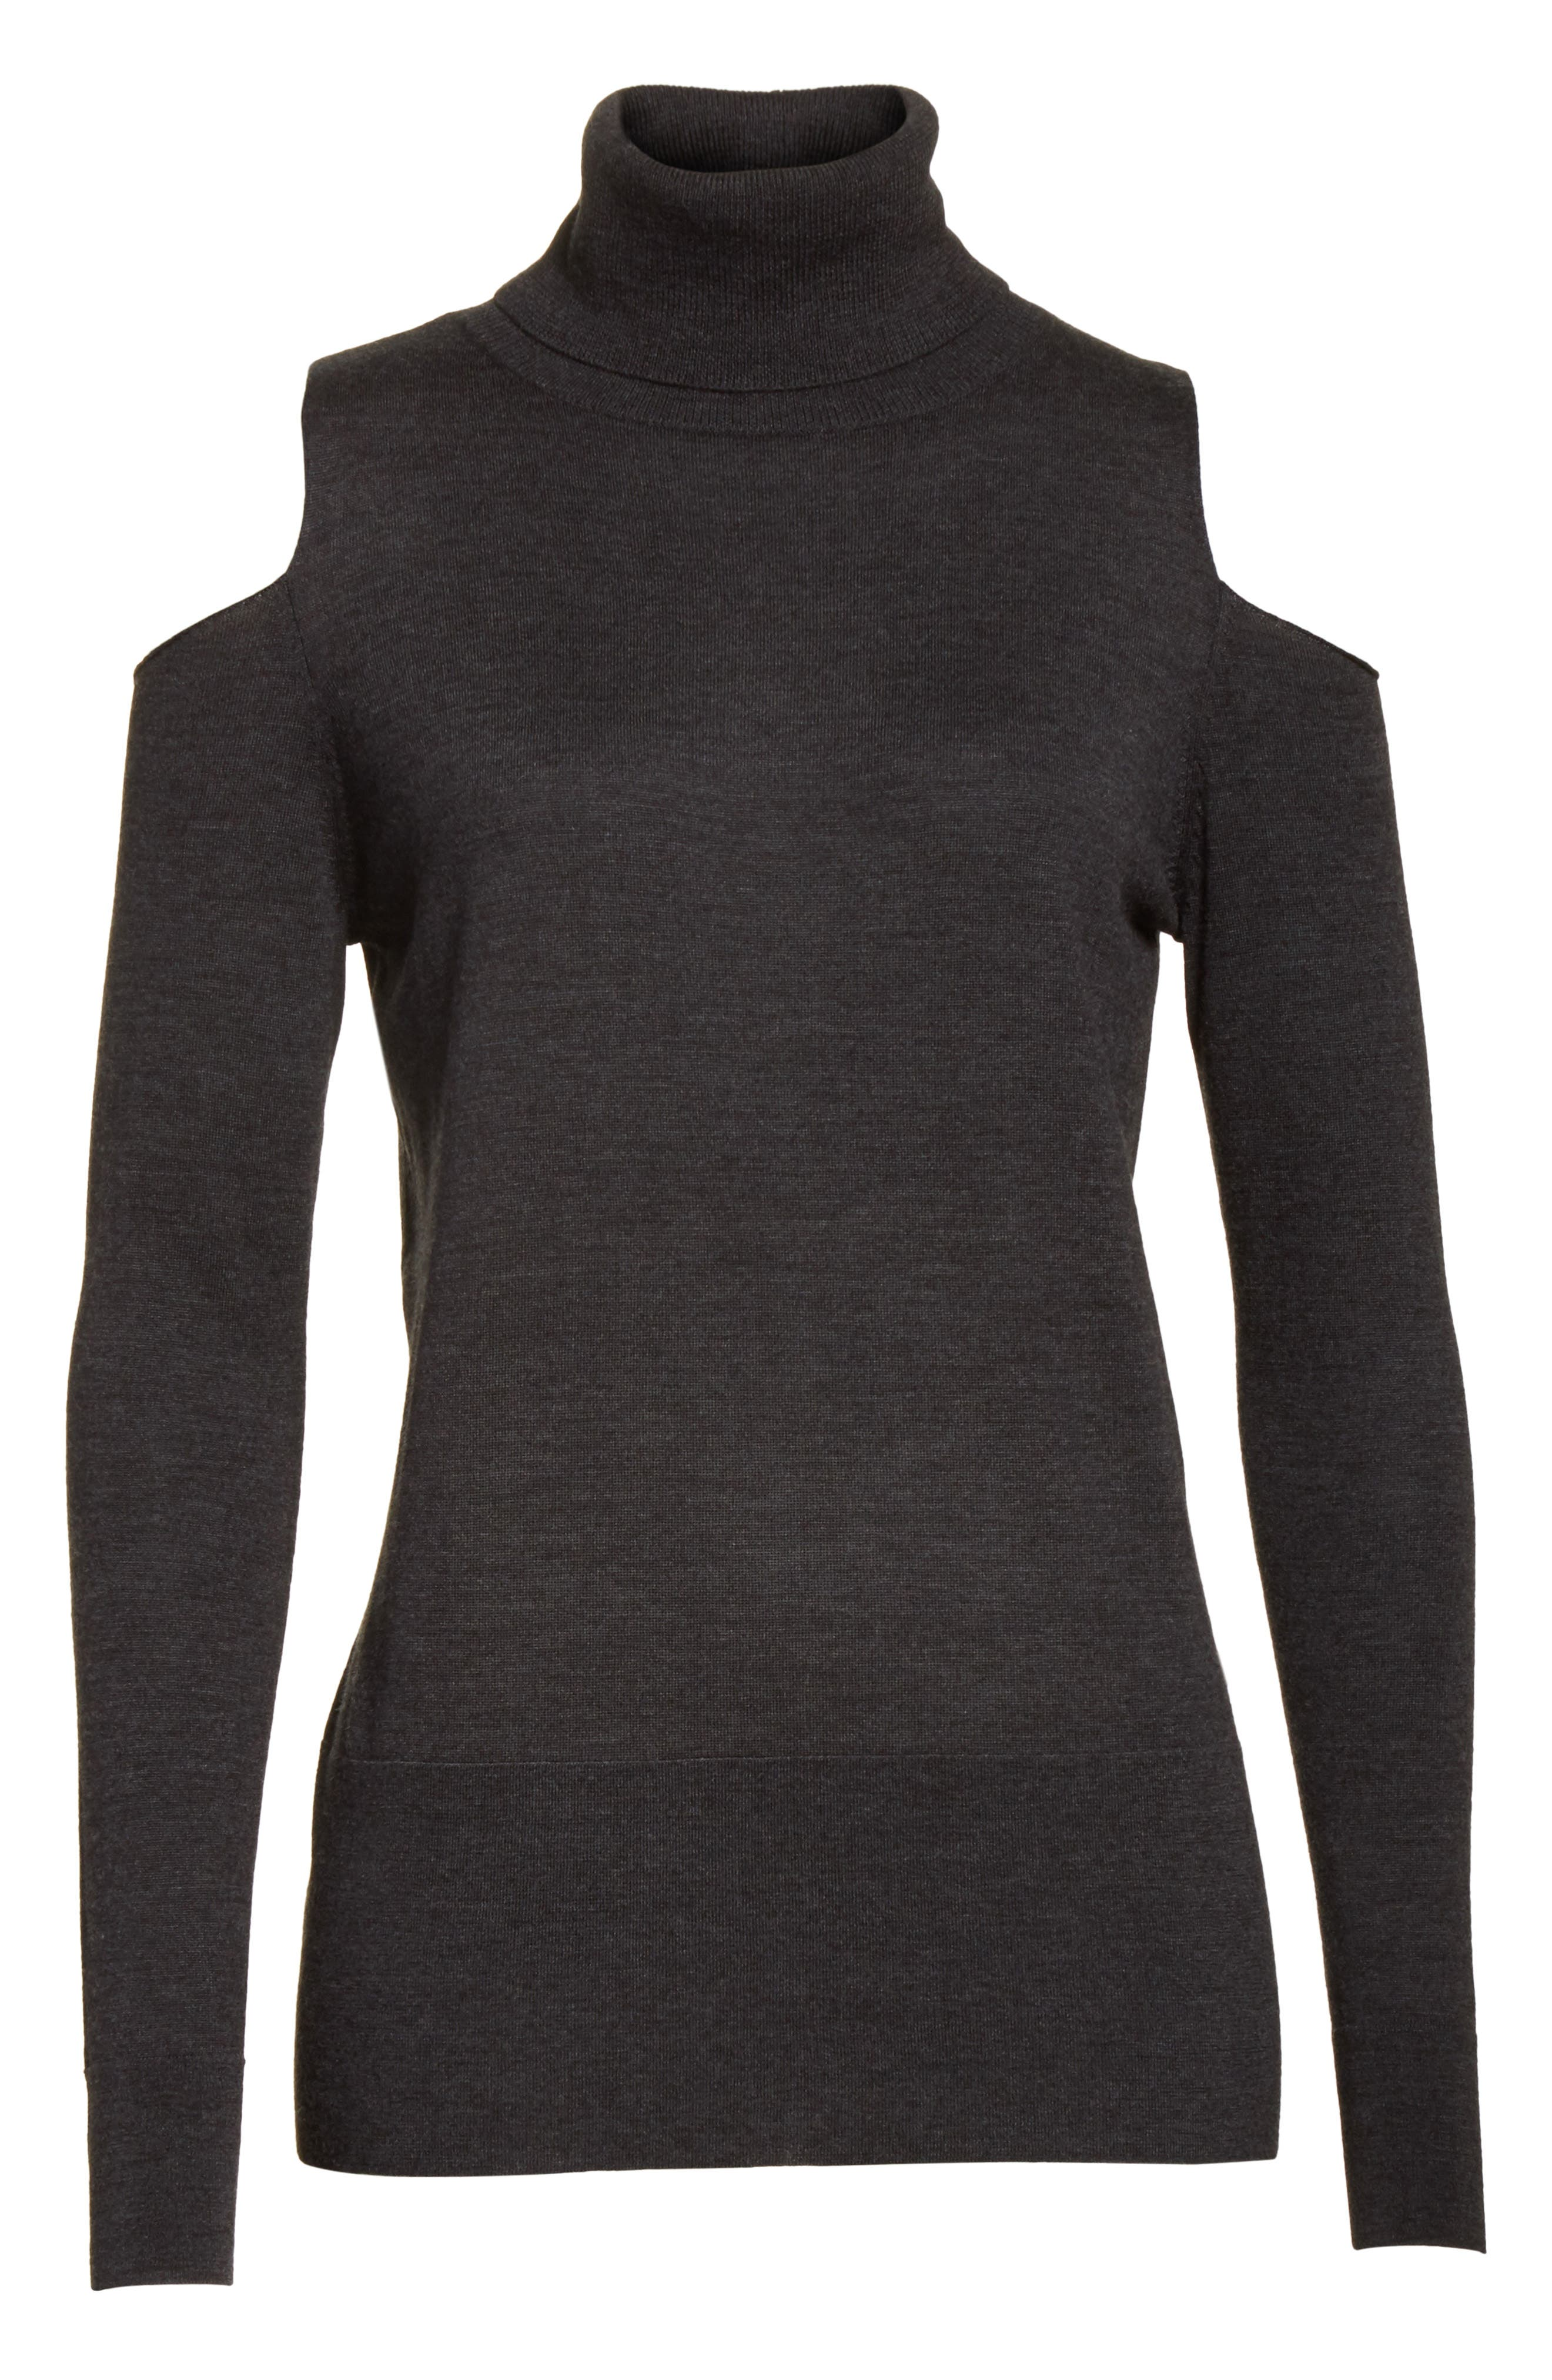 Merino Wool Cold Shoulder Turtleneck Sweater,                             Alternate thumbnail 6, color,                             084